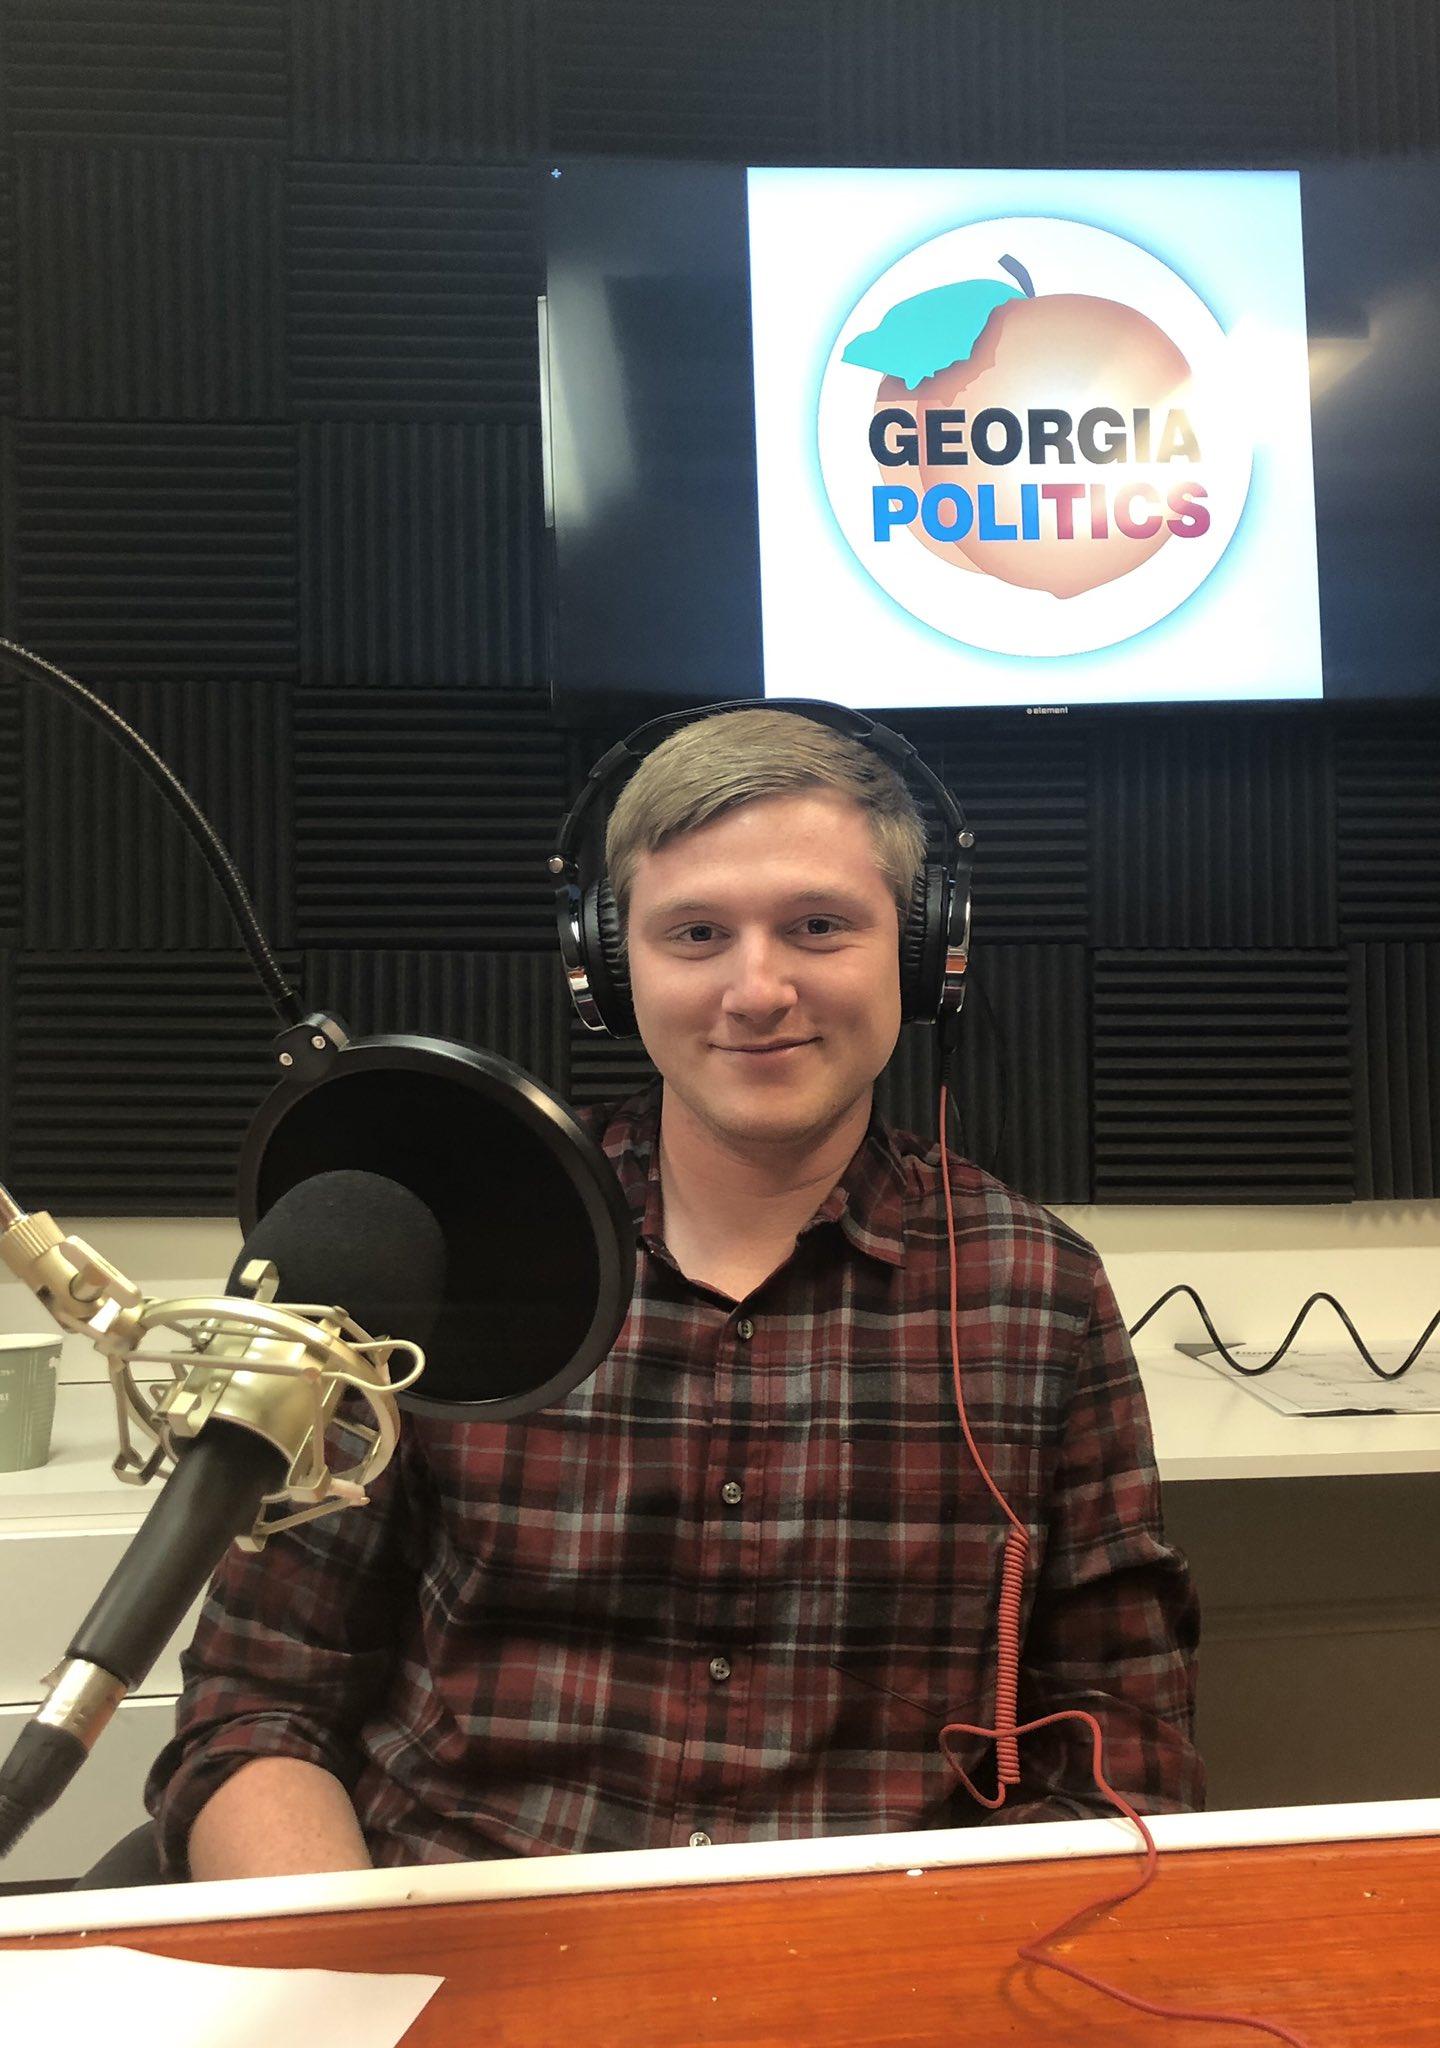 Preston also hosts the Georgia Politics Podcast with the Appen Media Network.